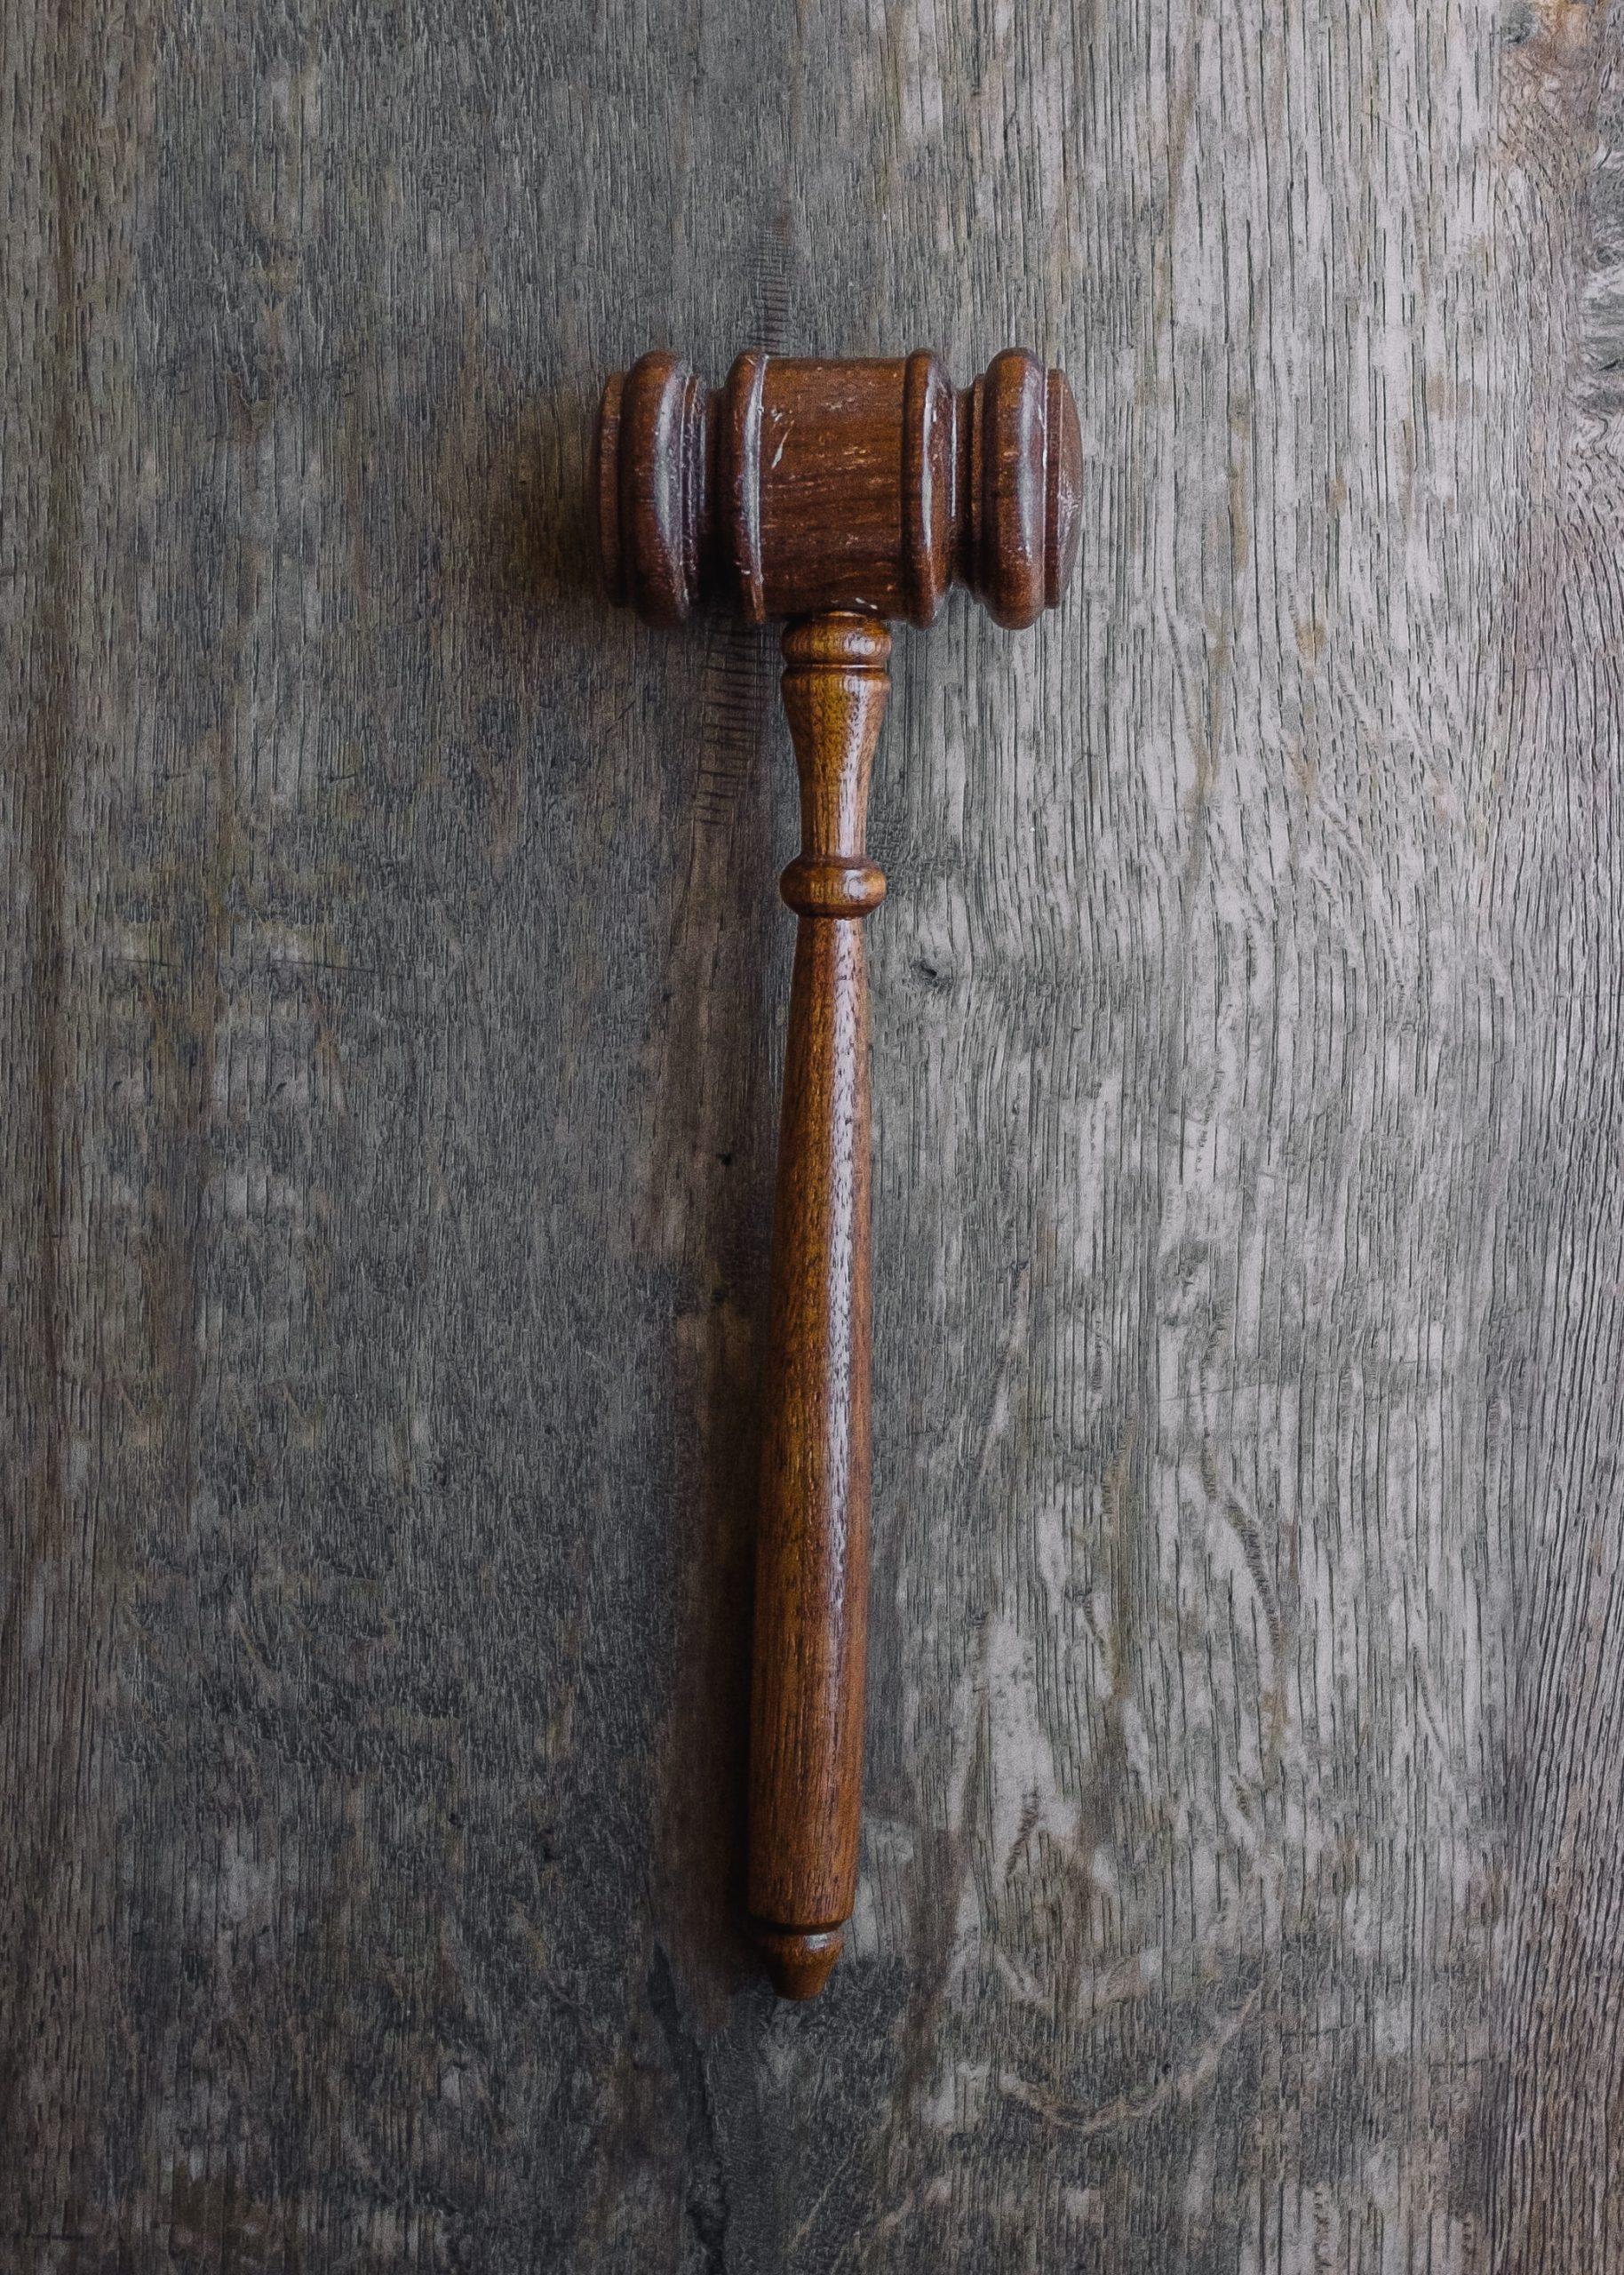 Bitcoin trust, a judge's hammer